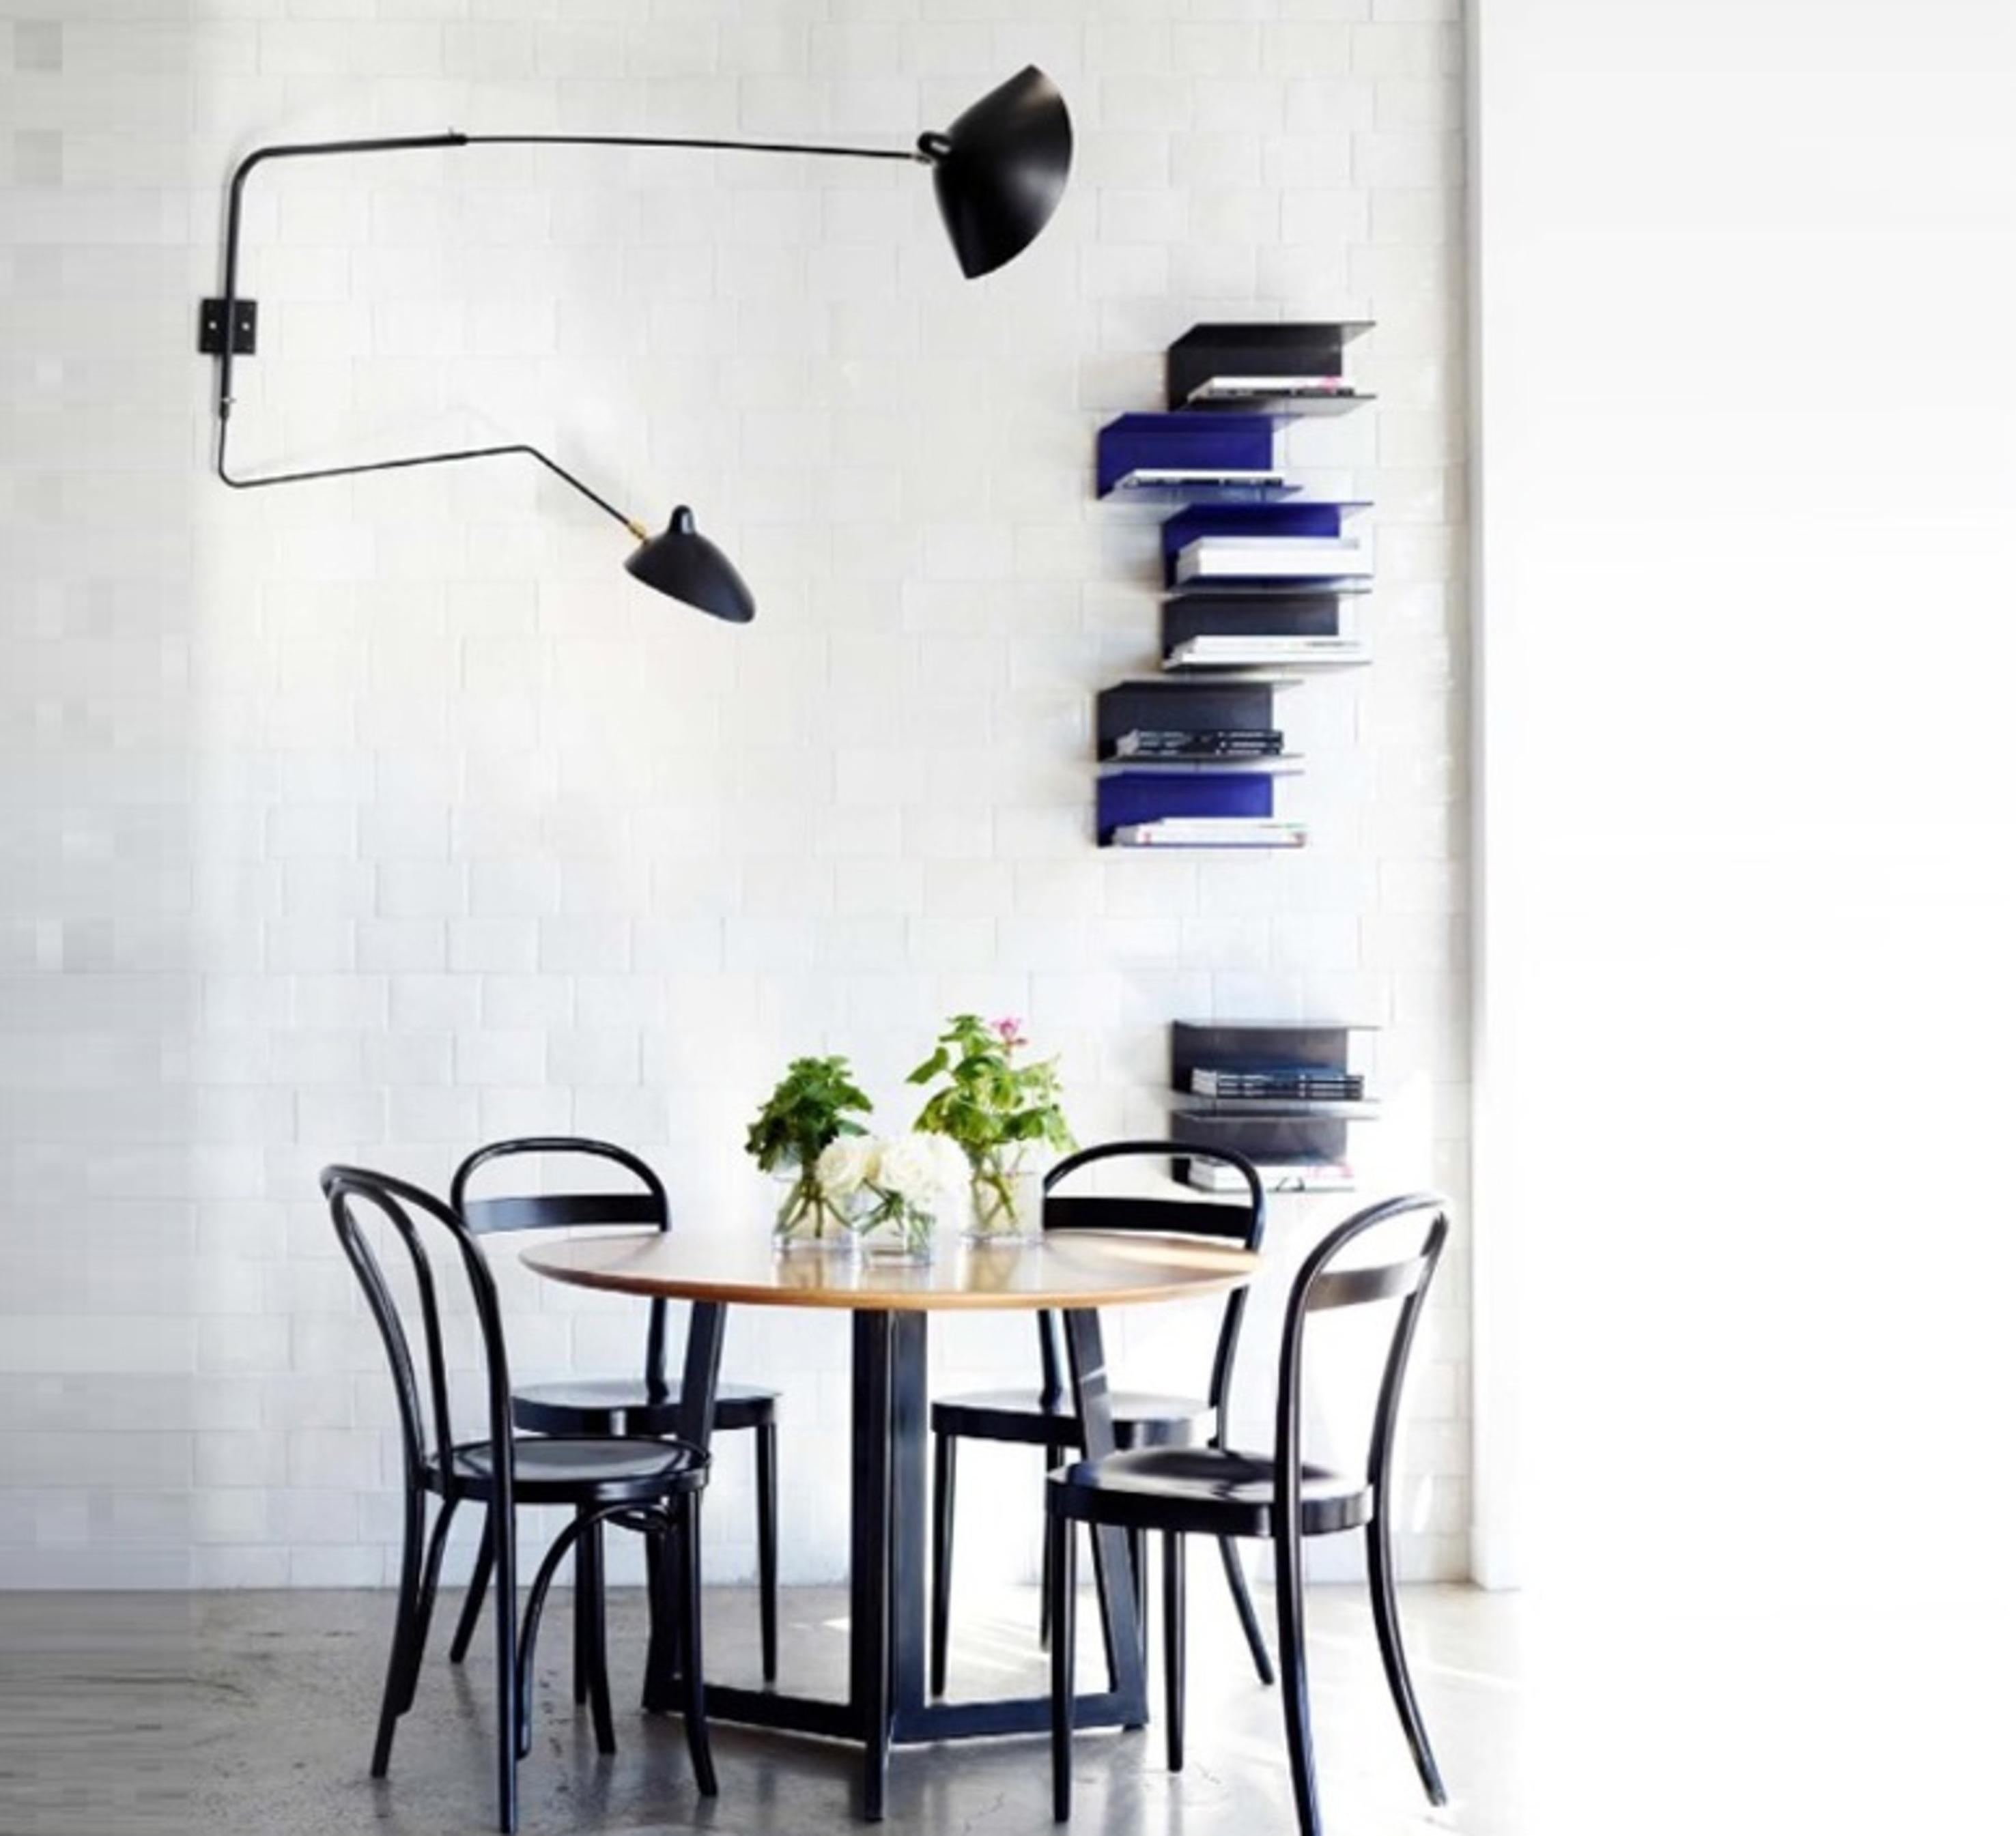 2-bras-pivotants-dont-1-courbe_serge-mouille_editionssergemouille_ap2b1c-noir_luminaire_lighting_design_signed-20816-product